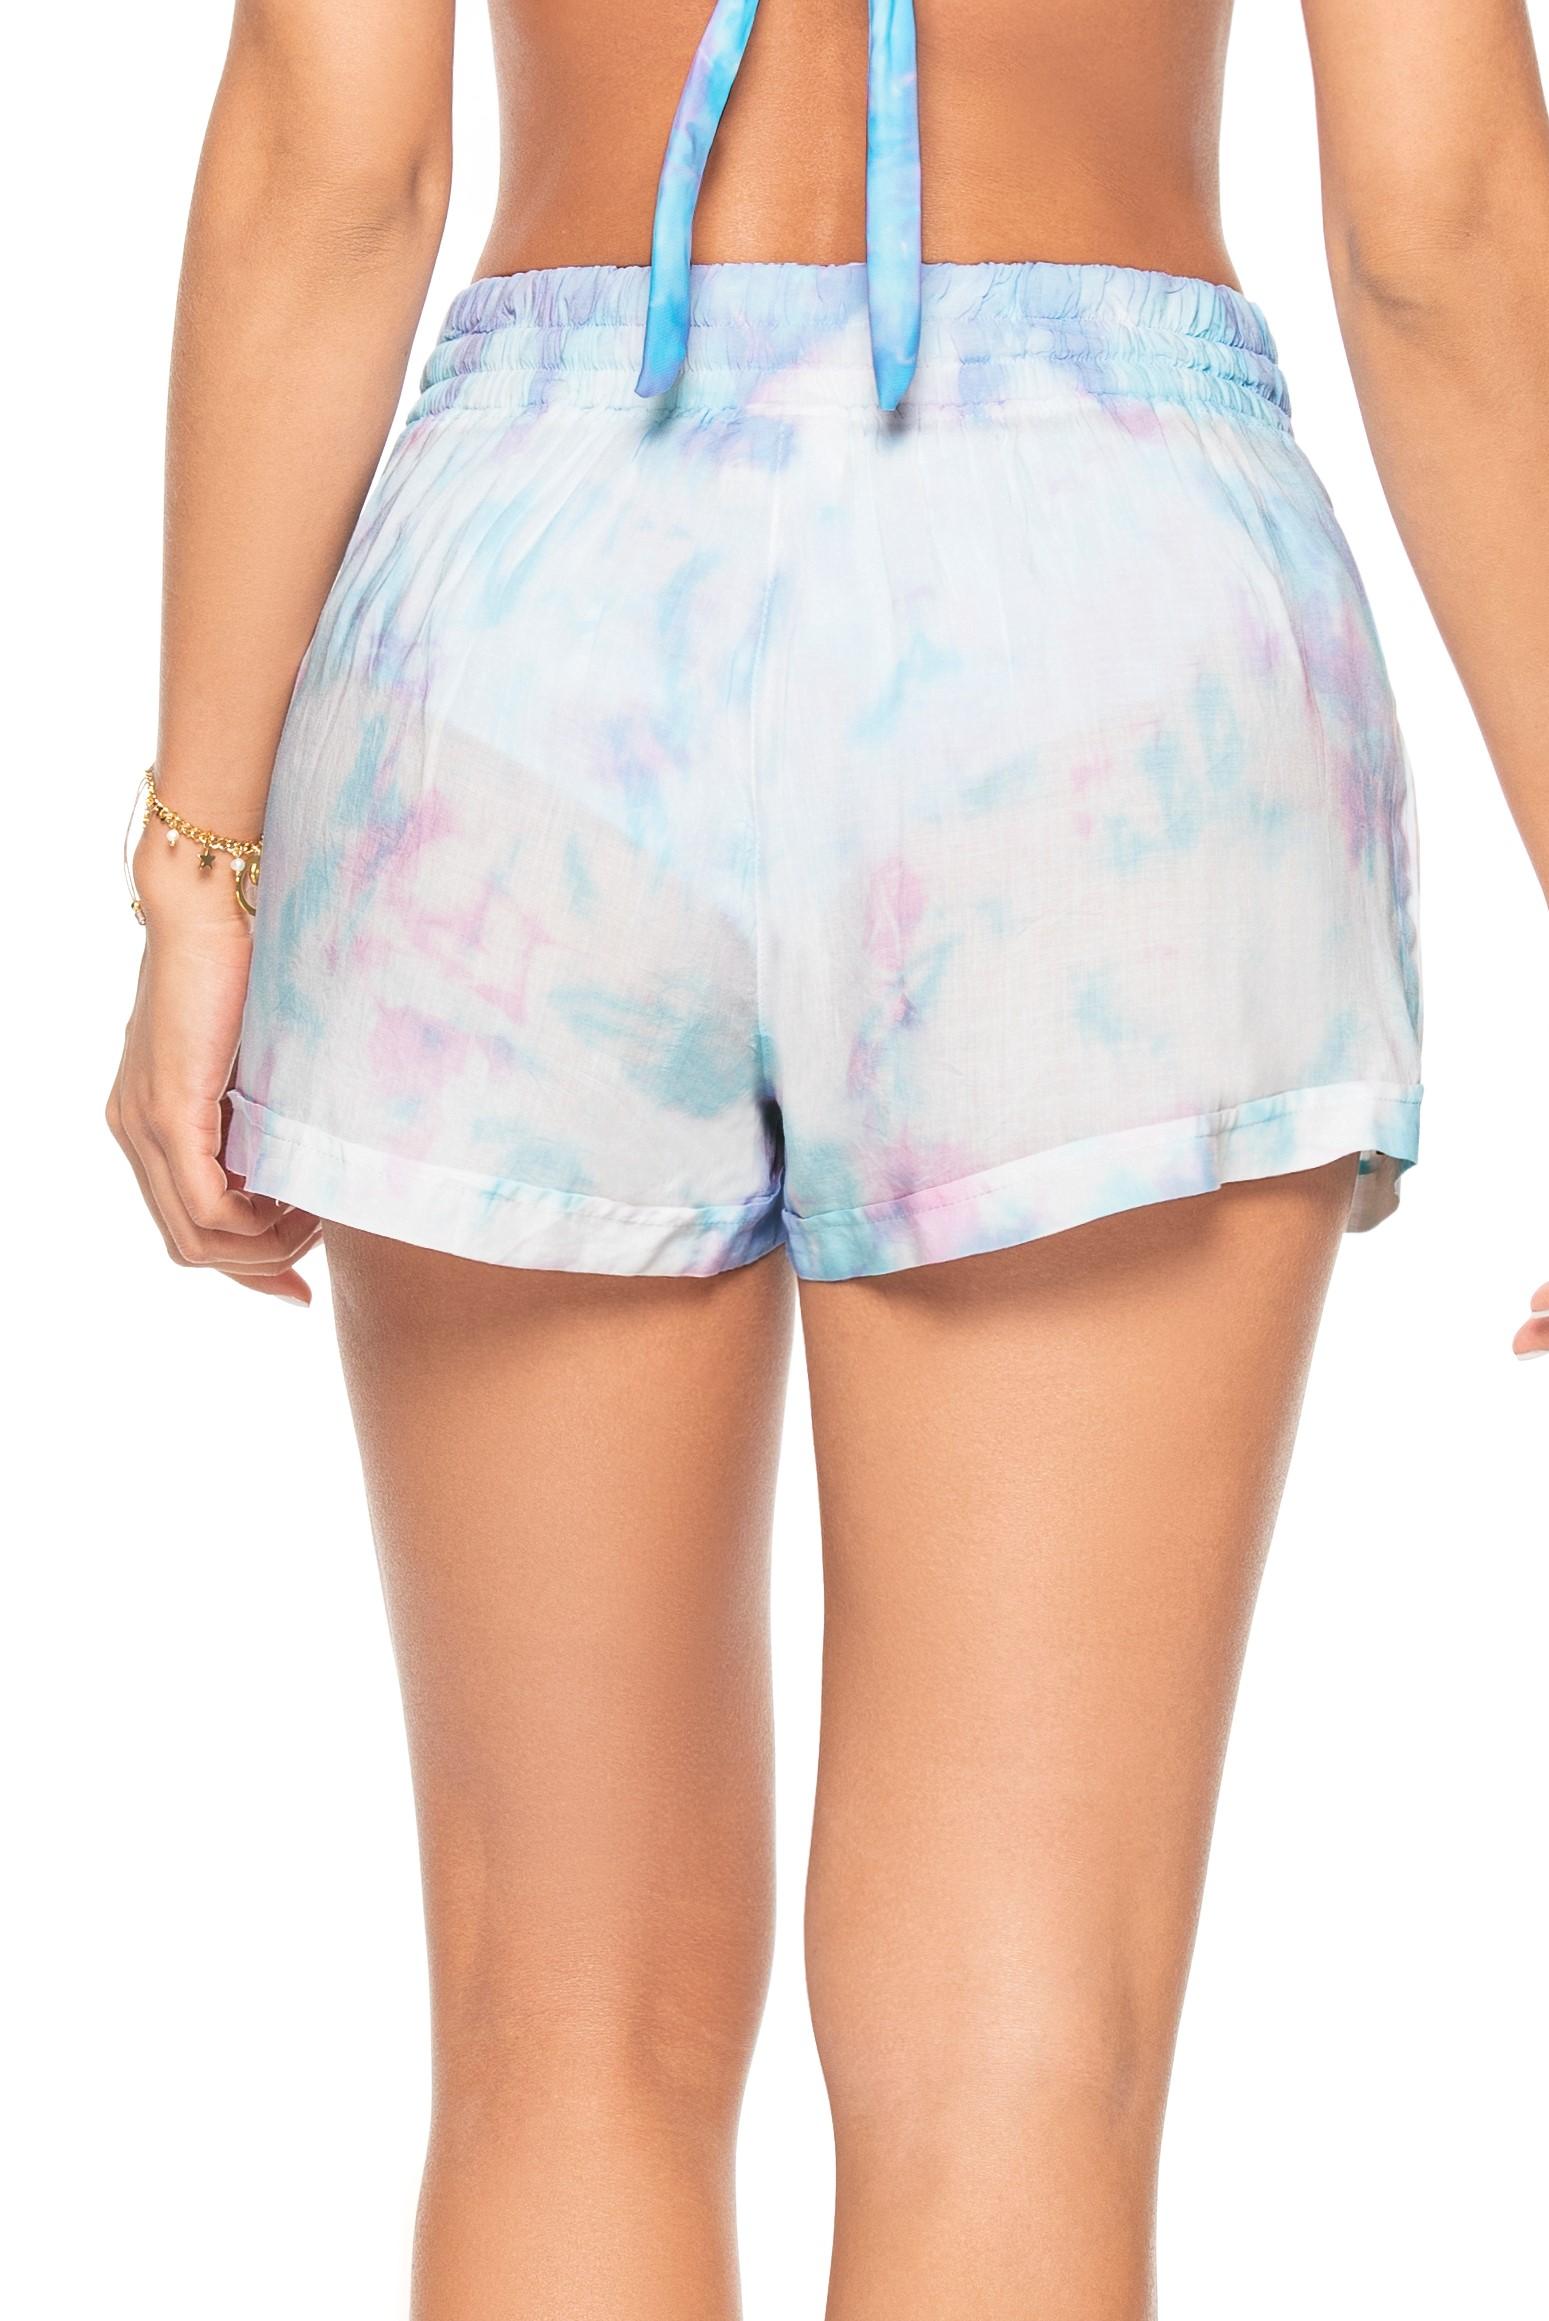 Phax Bella Iceland Blauwe Tie Dye Strand Short